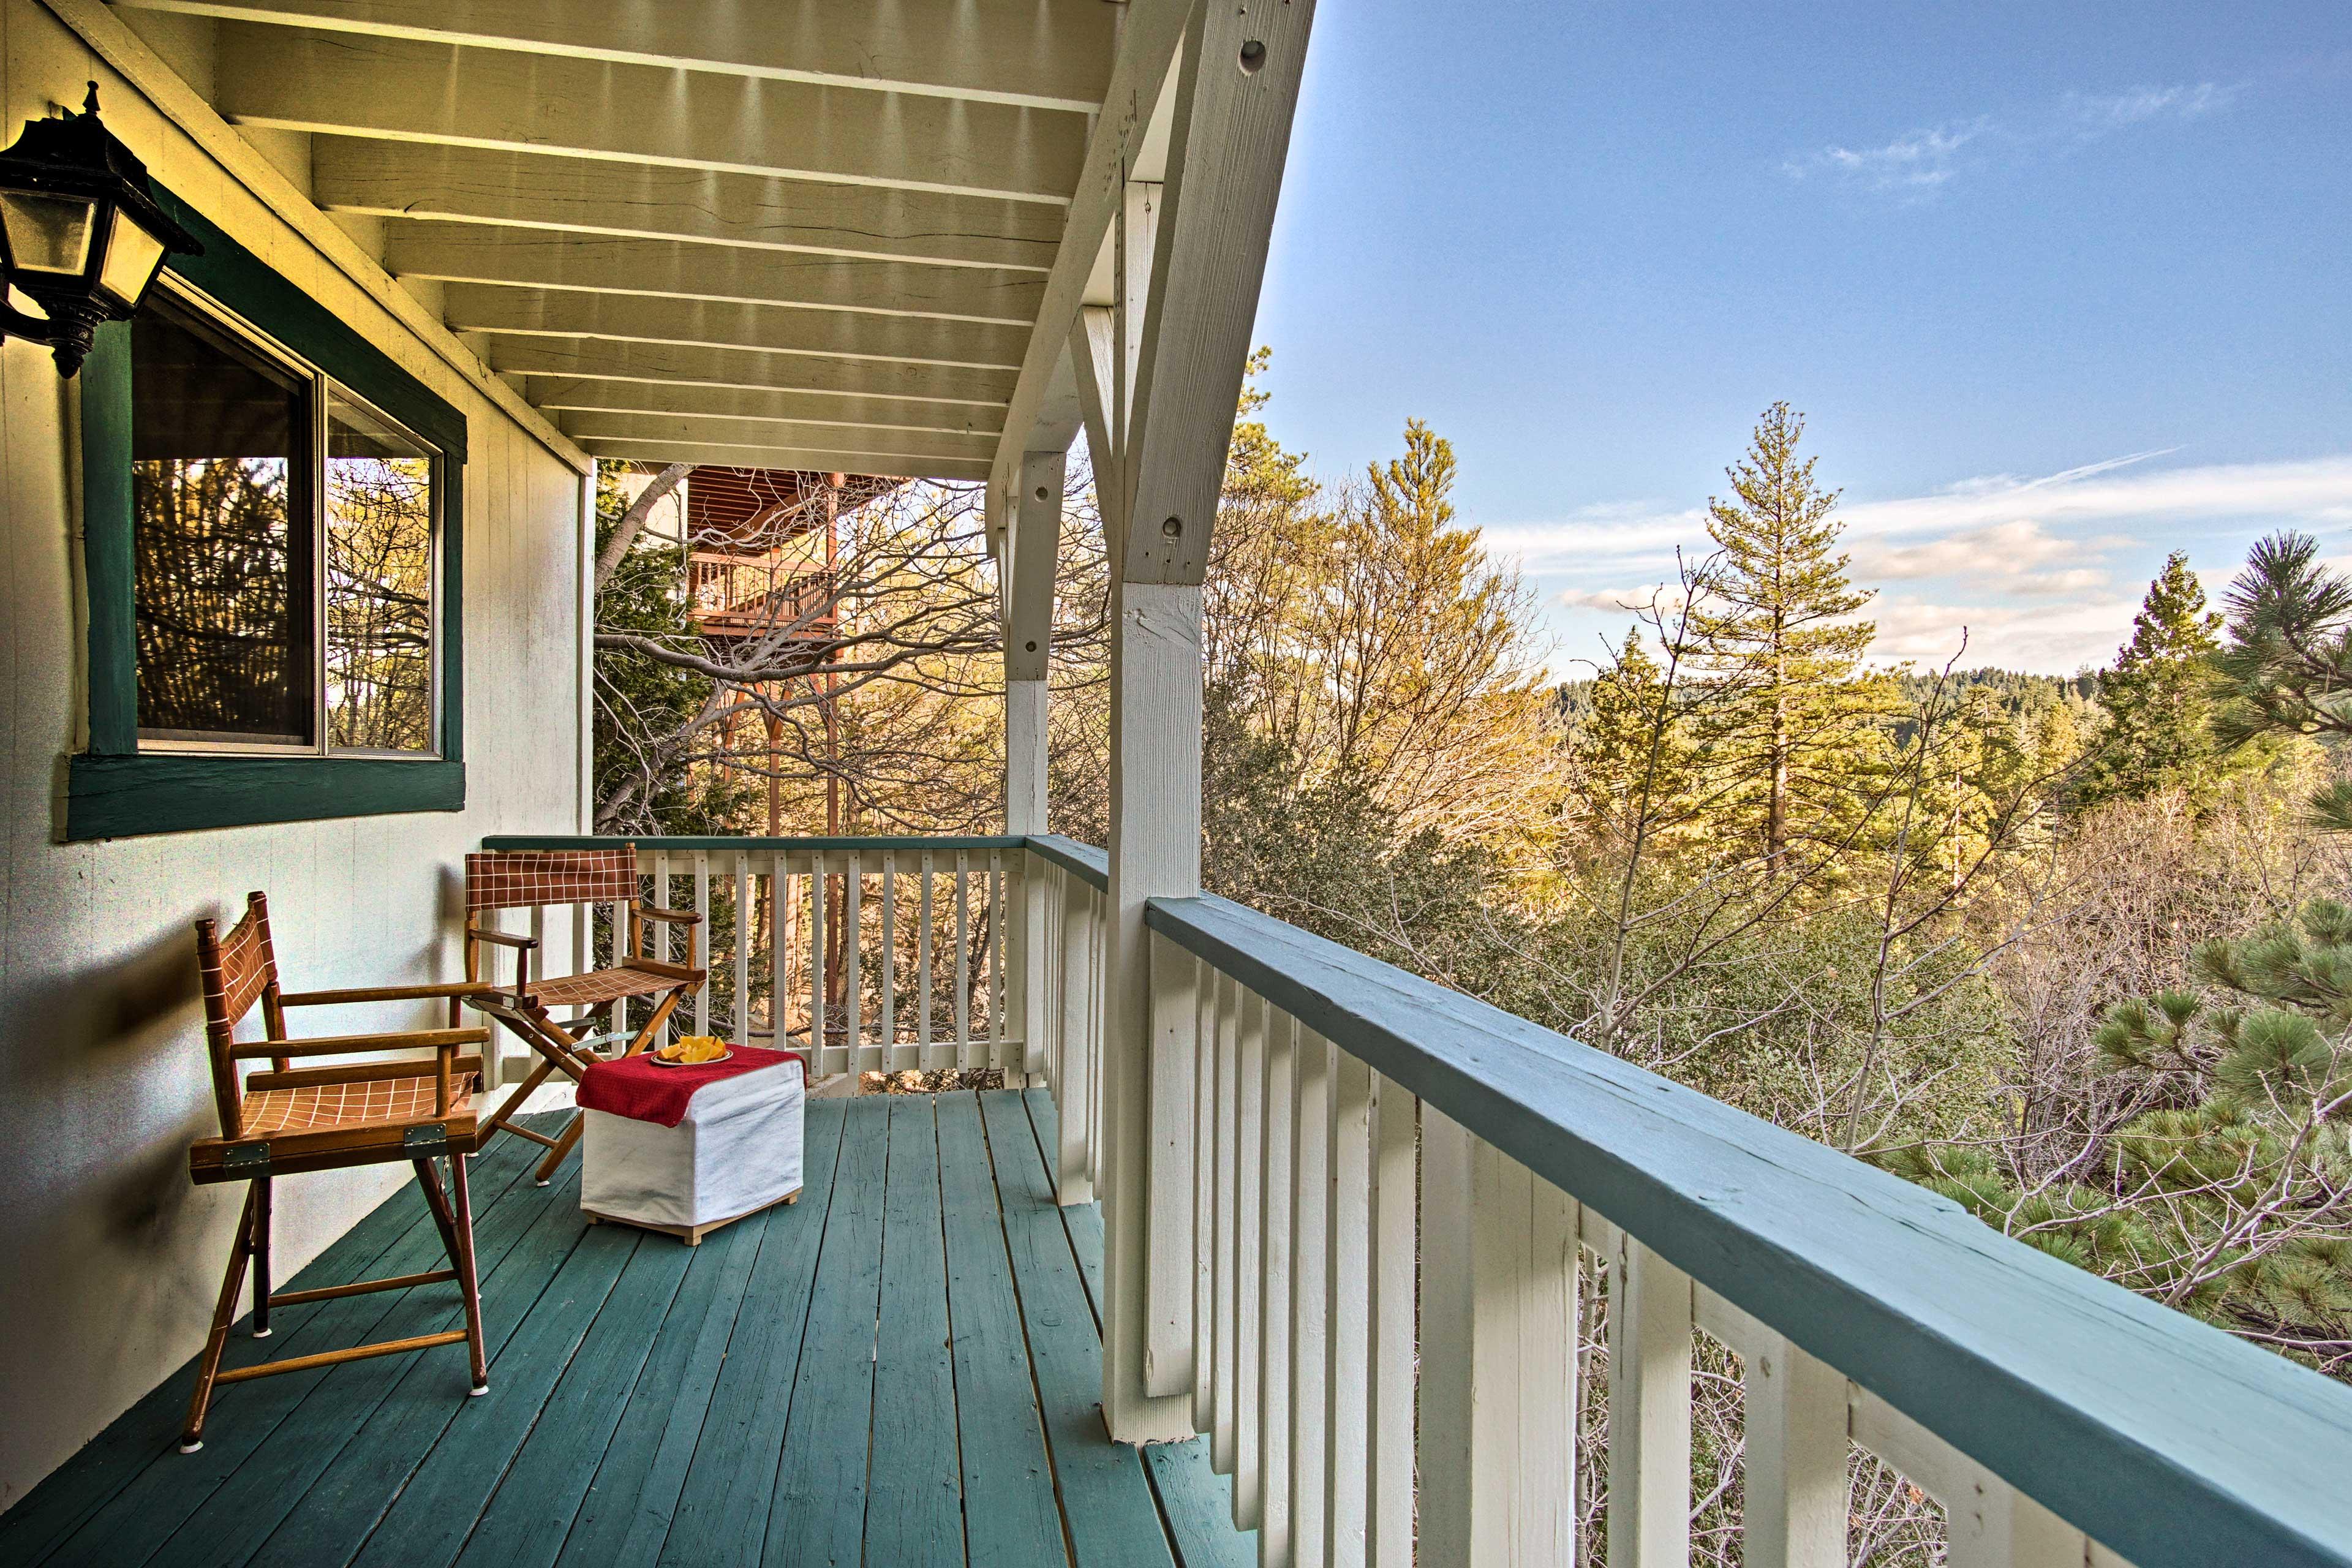 Make this property your next California mountain retreat.